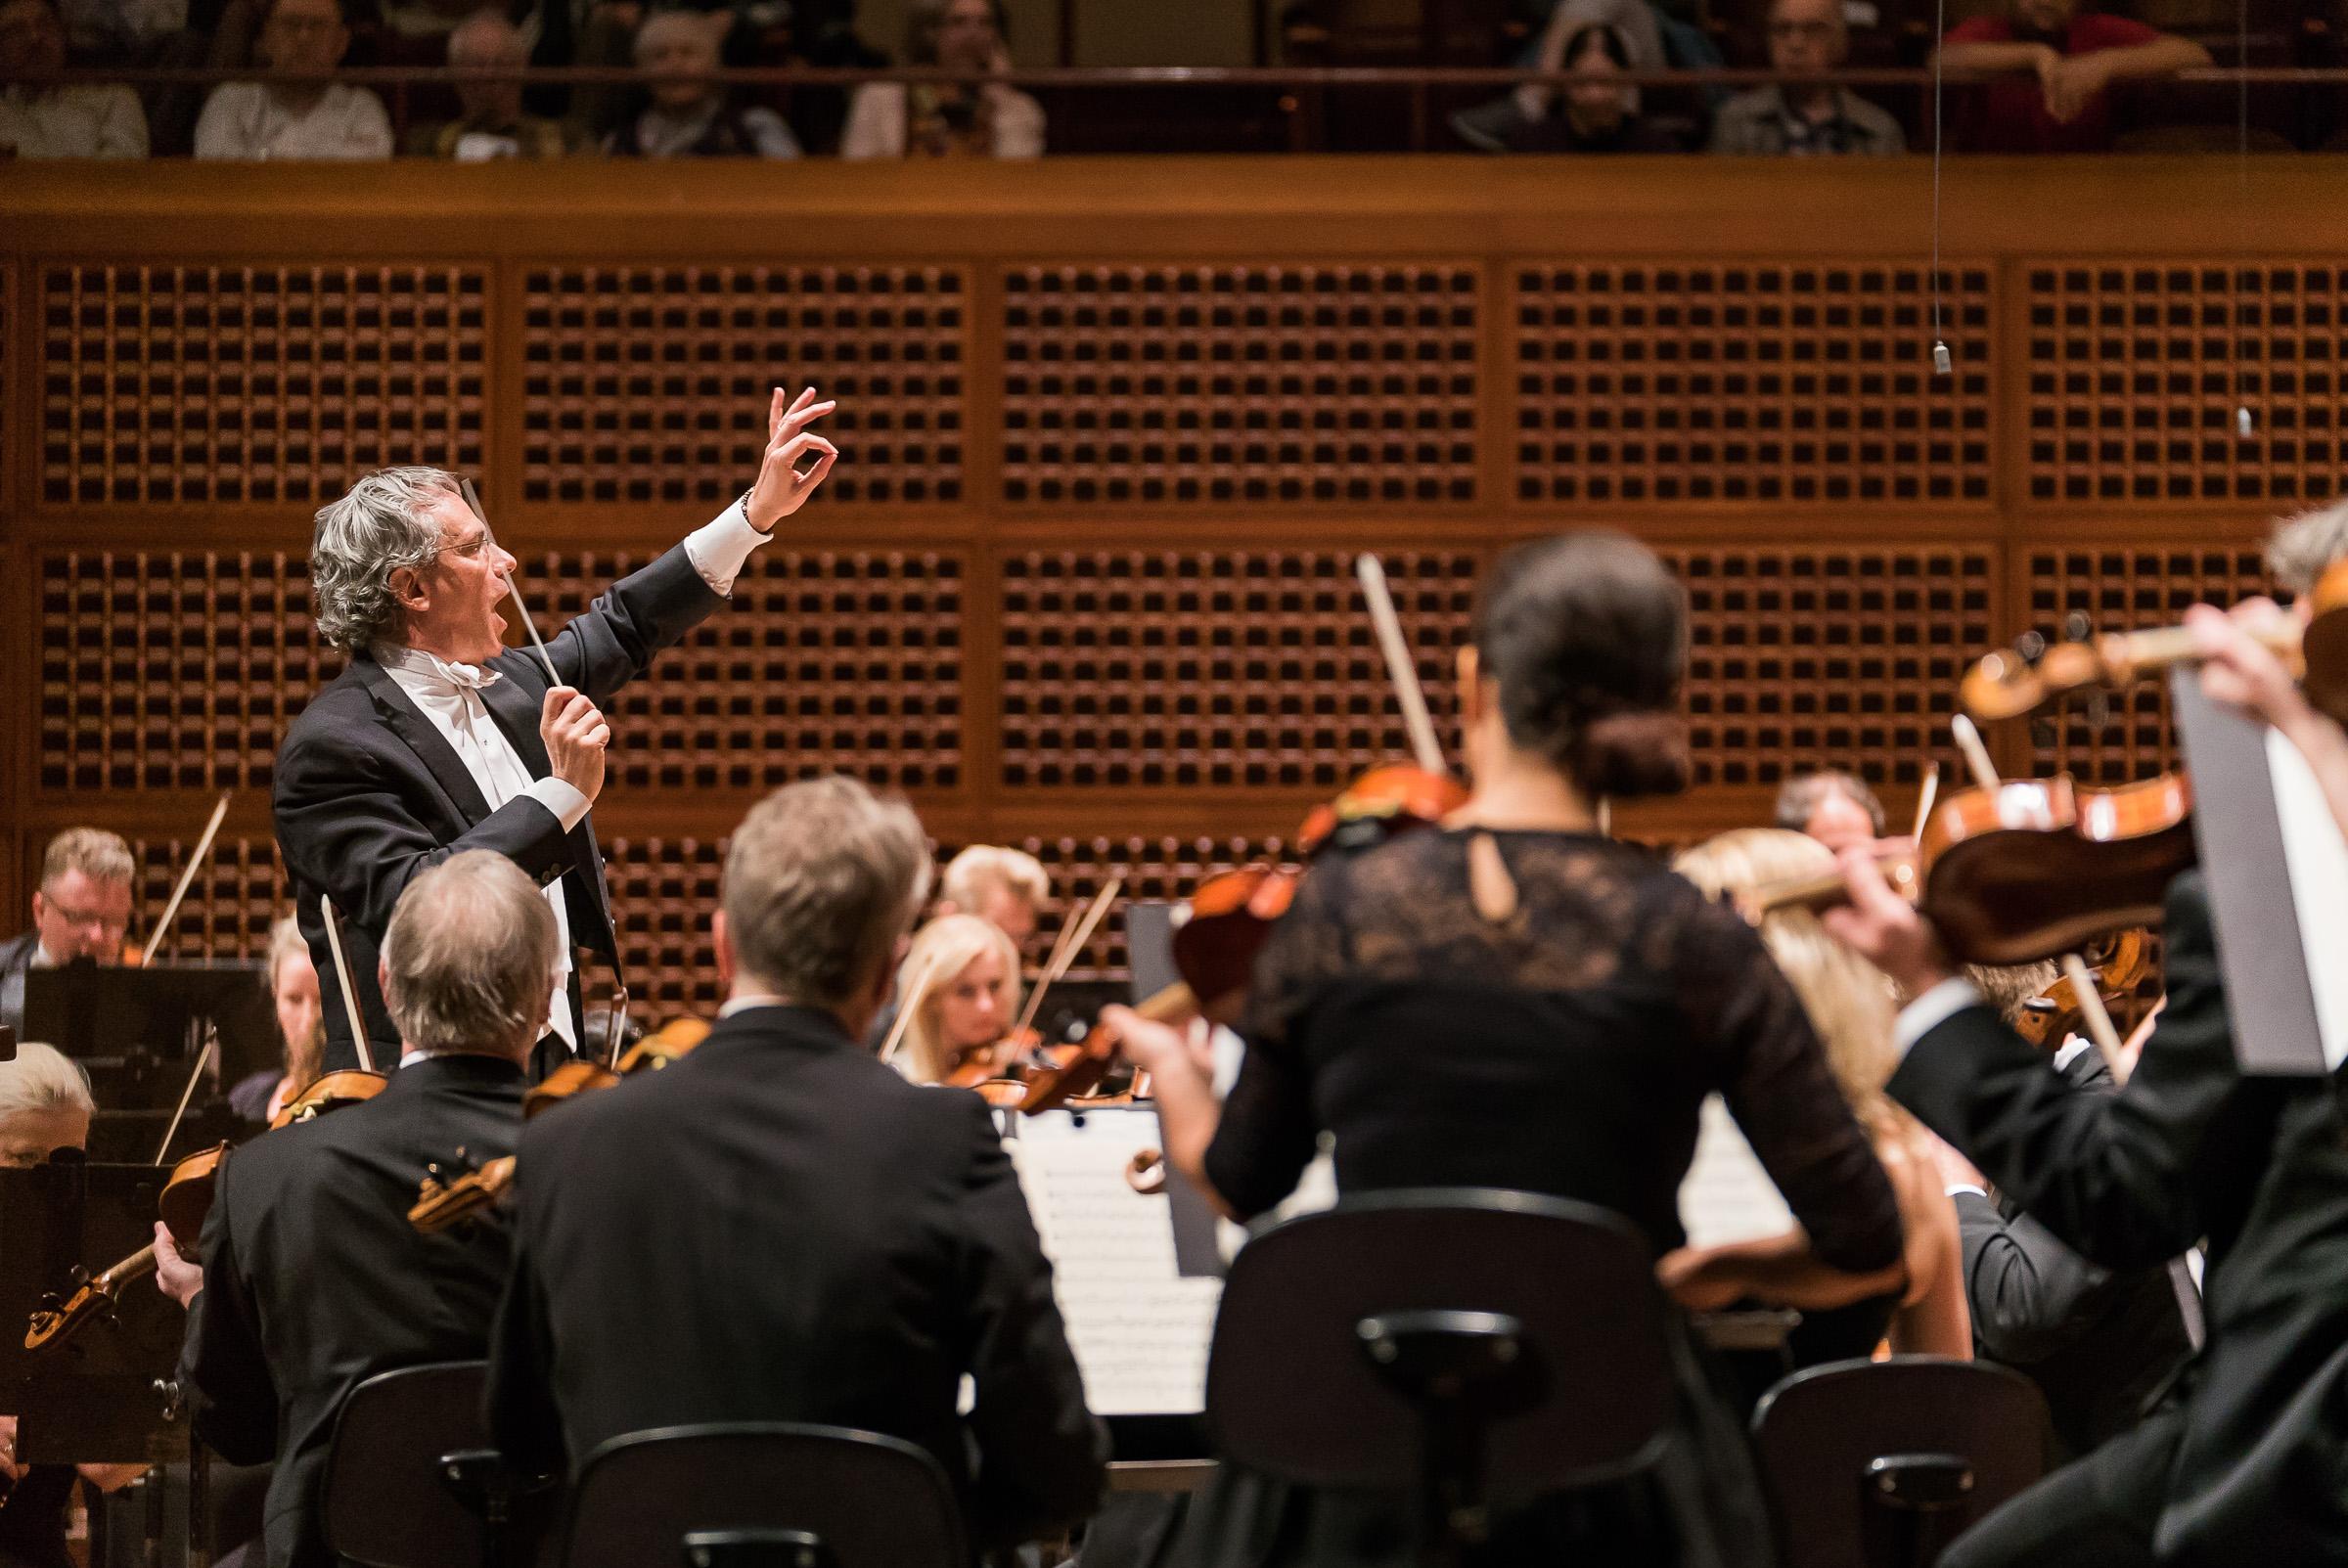 danish_national_symphony_orchestra_davies_hall_brandon_patoc_luisi_0012.jpg